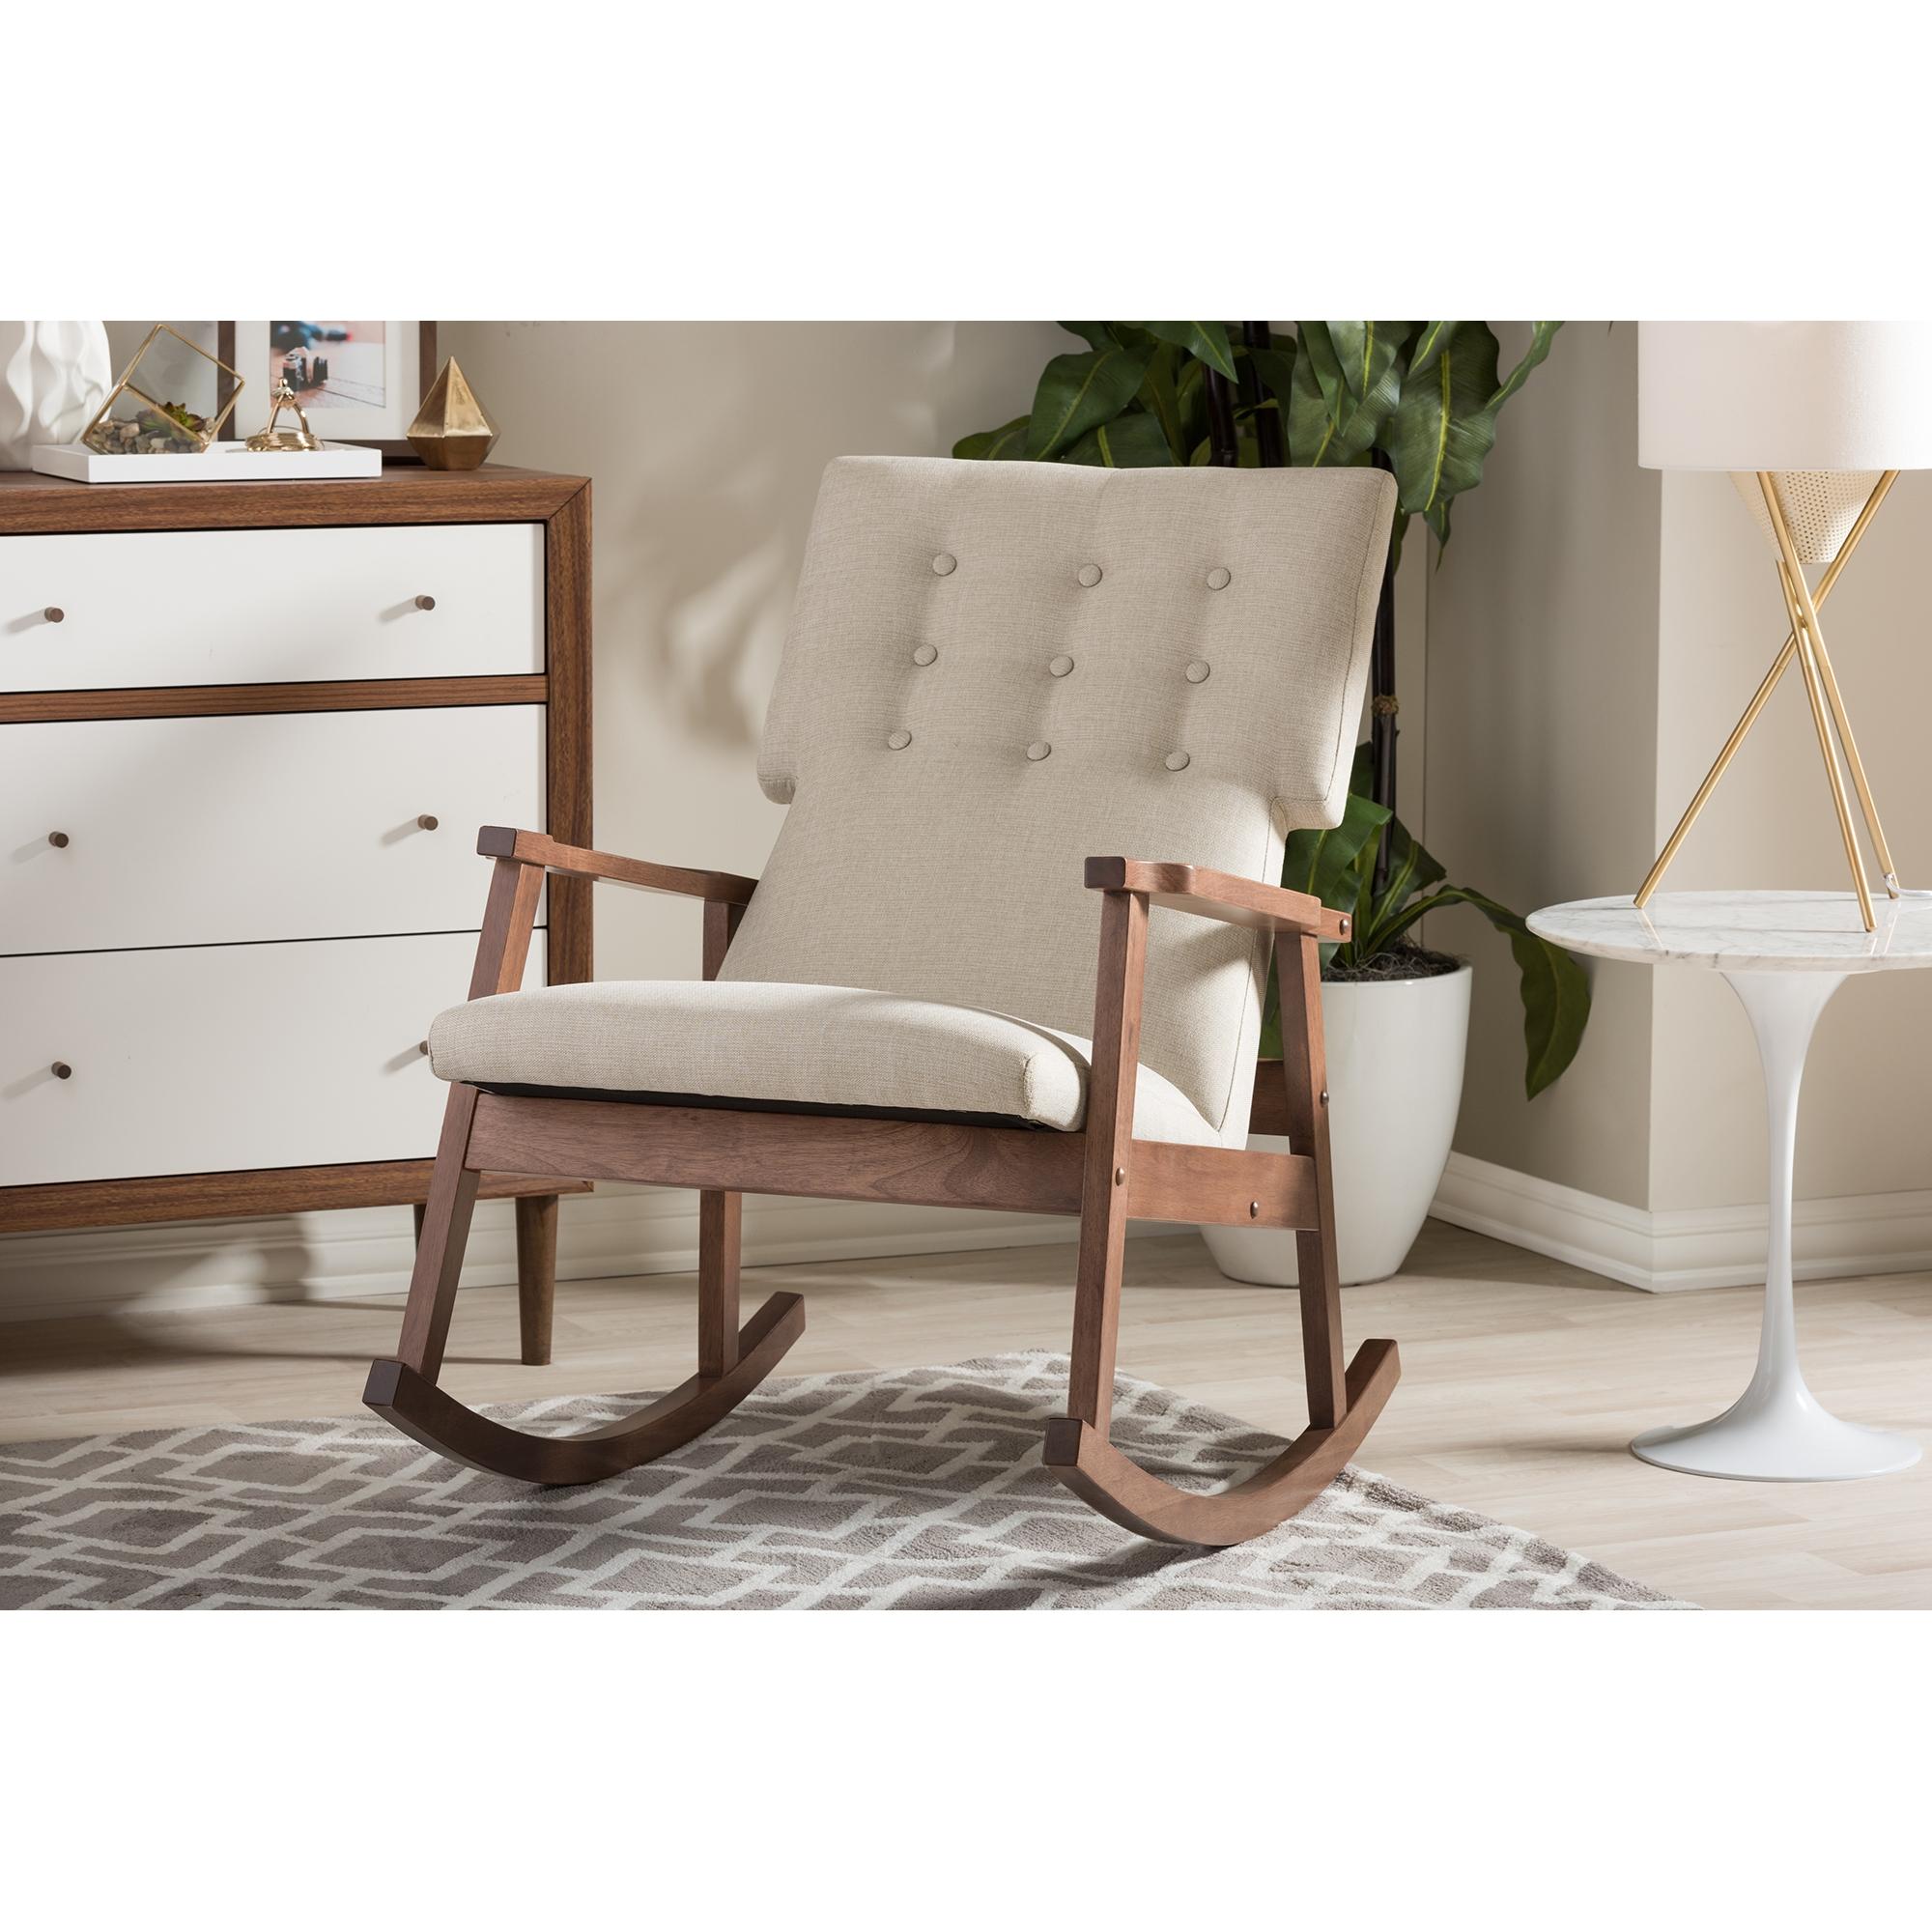 Superb Living Room Furniture Grey Baxton Studio Agatha Mid Century Bralicious Painted Fabric Chair Ideas Braliciousco